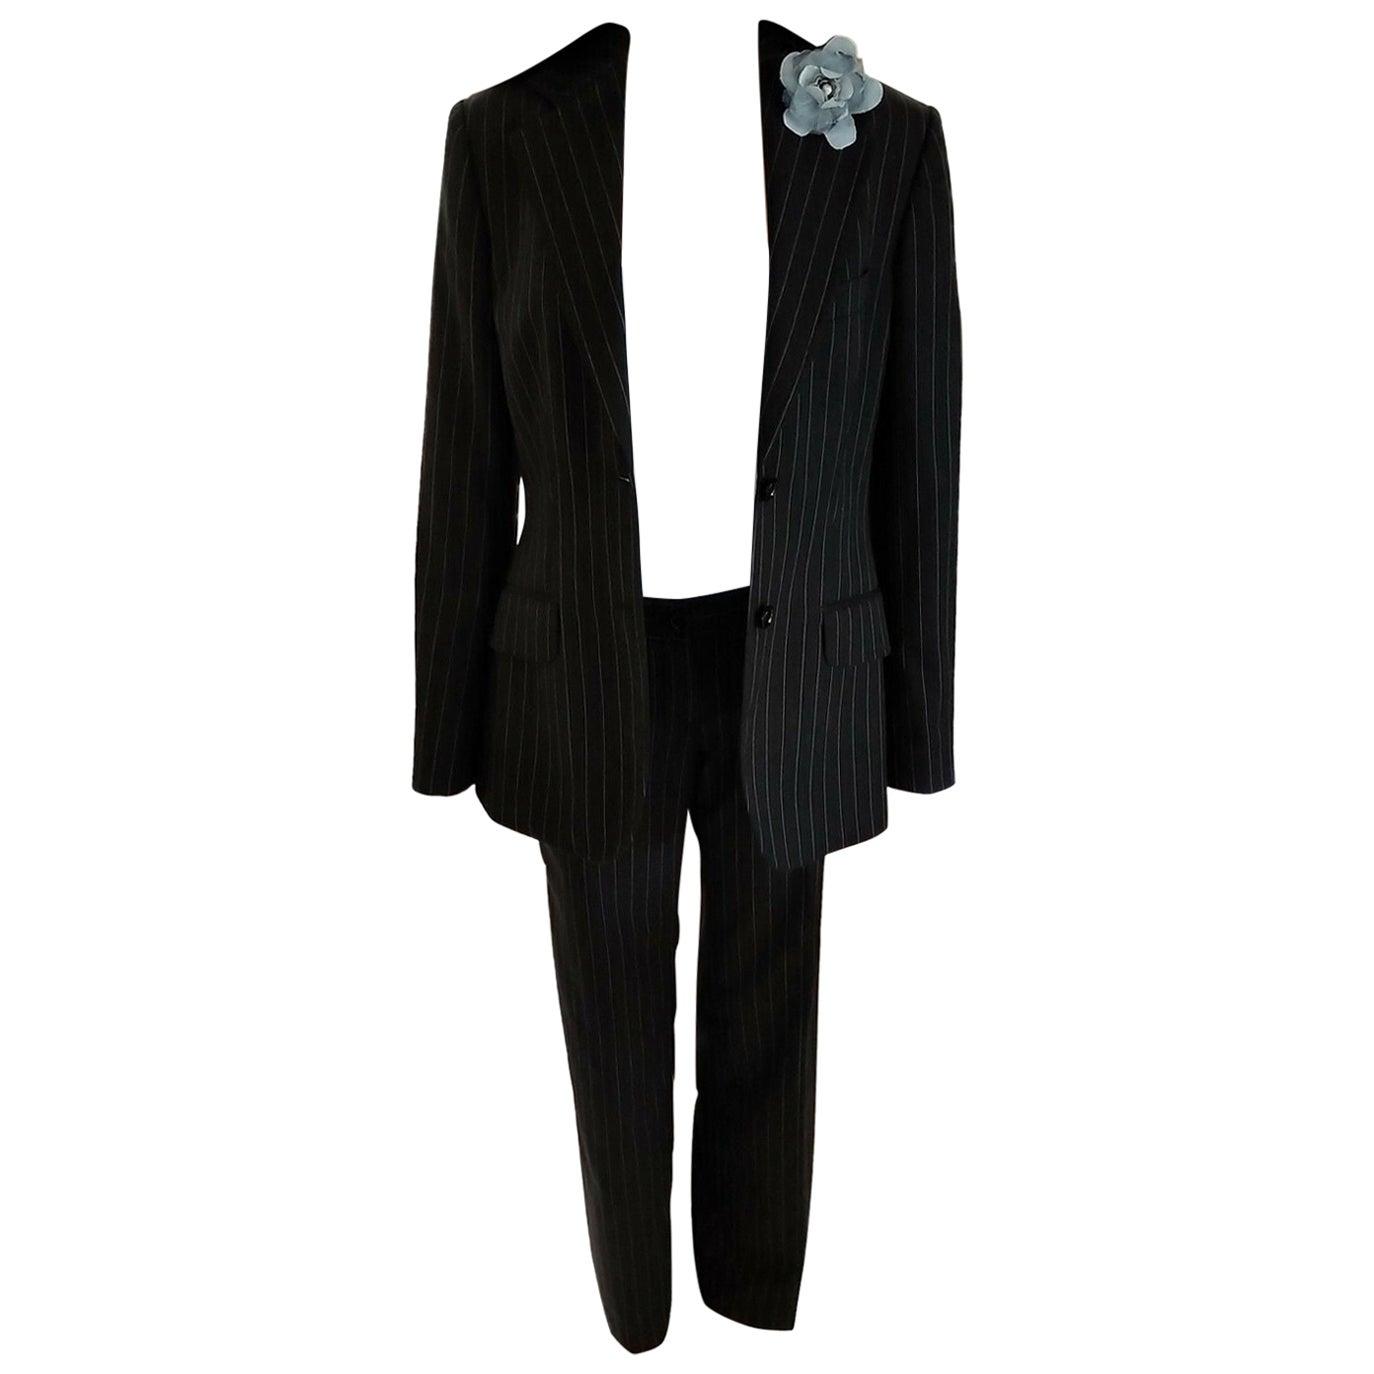 Dolce & Gabbana Charcoal Black & Sky Blue Pinstripe Jacket Pant Suit IT 40/ US 4